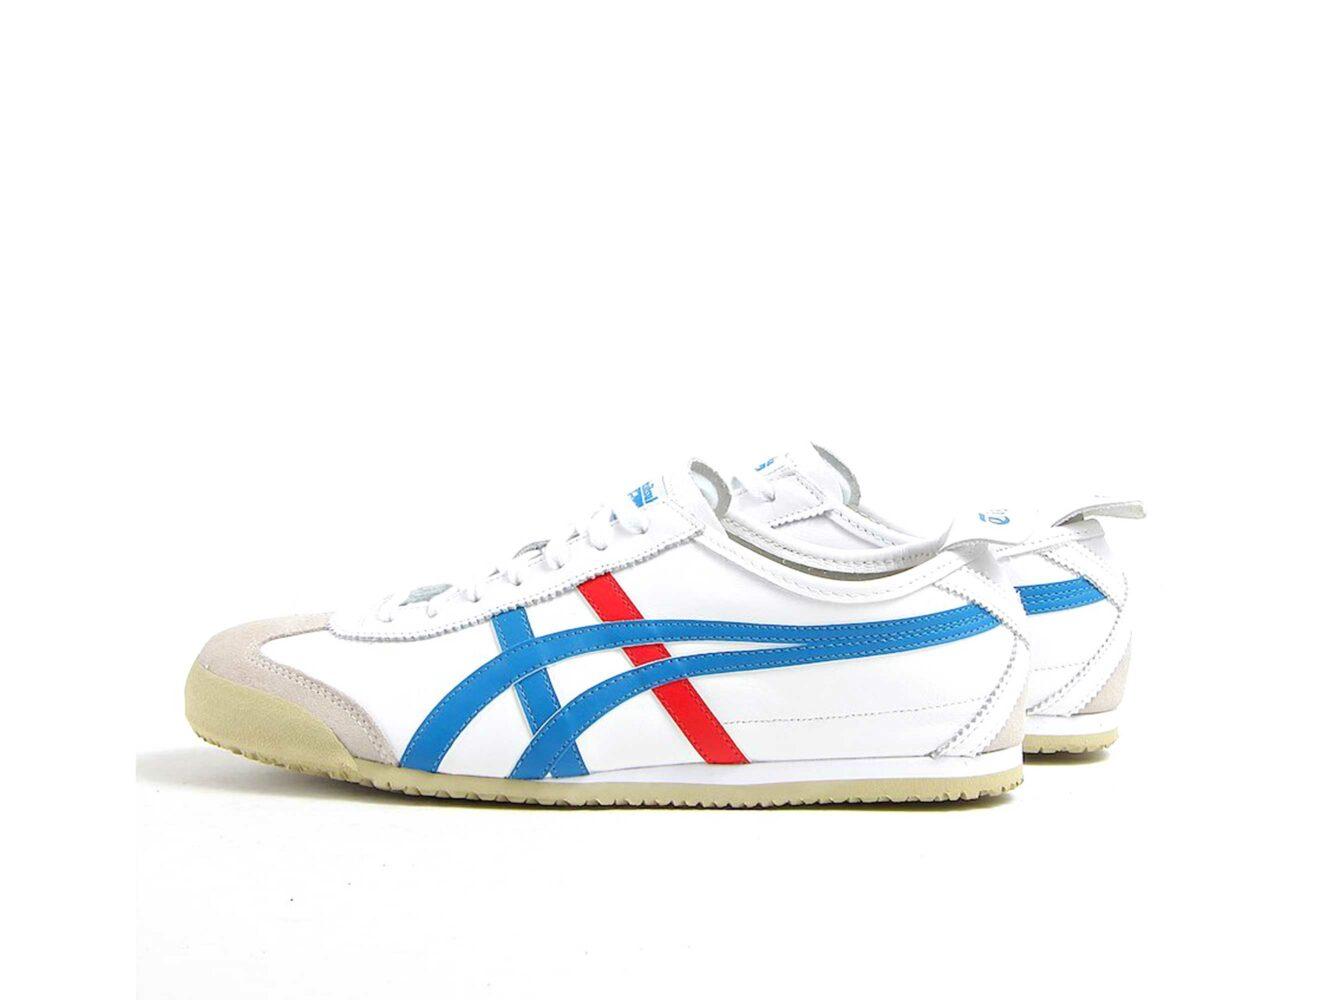 onitsuka tiger mexico 66 white blue купить